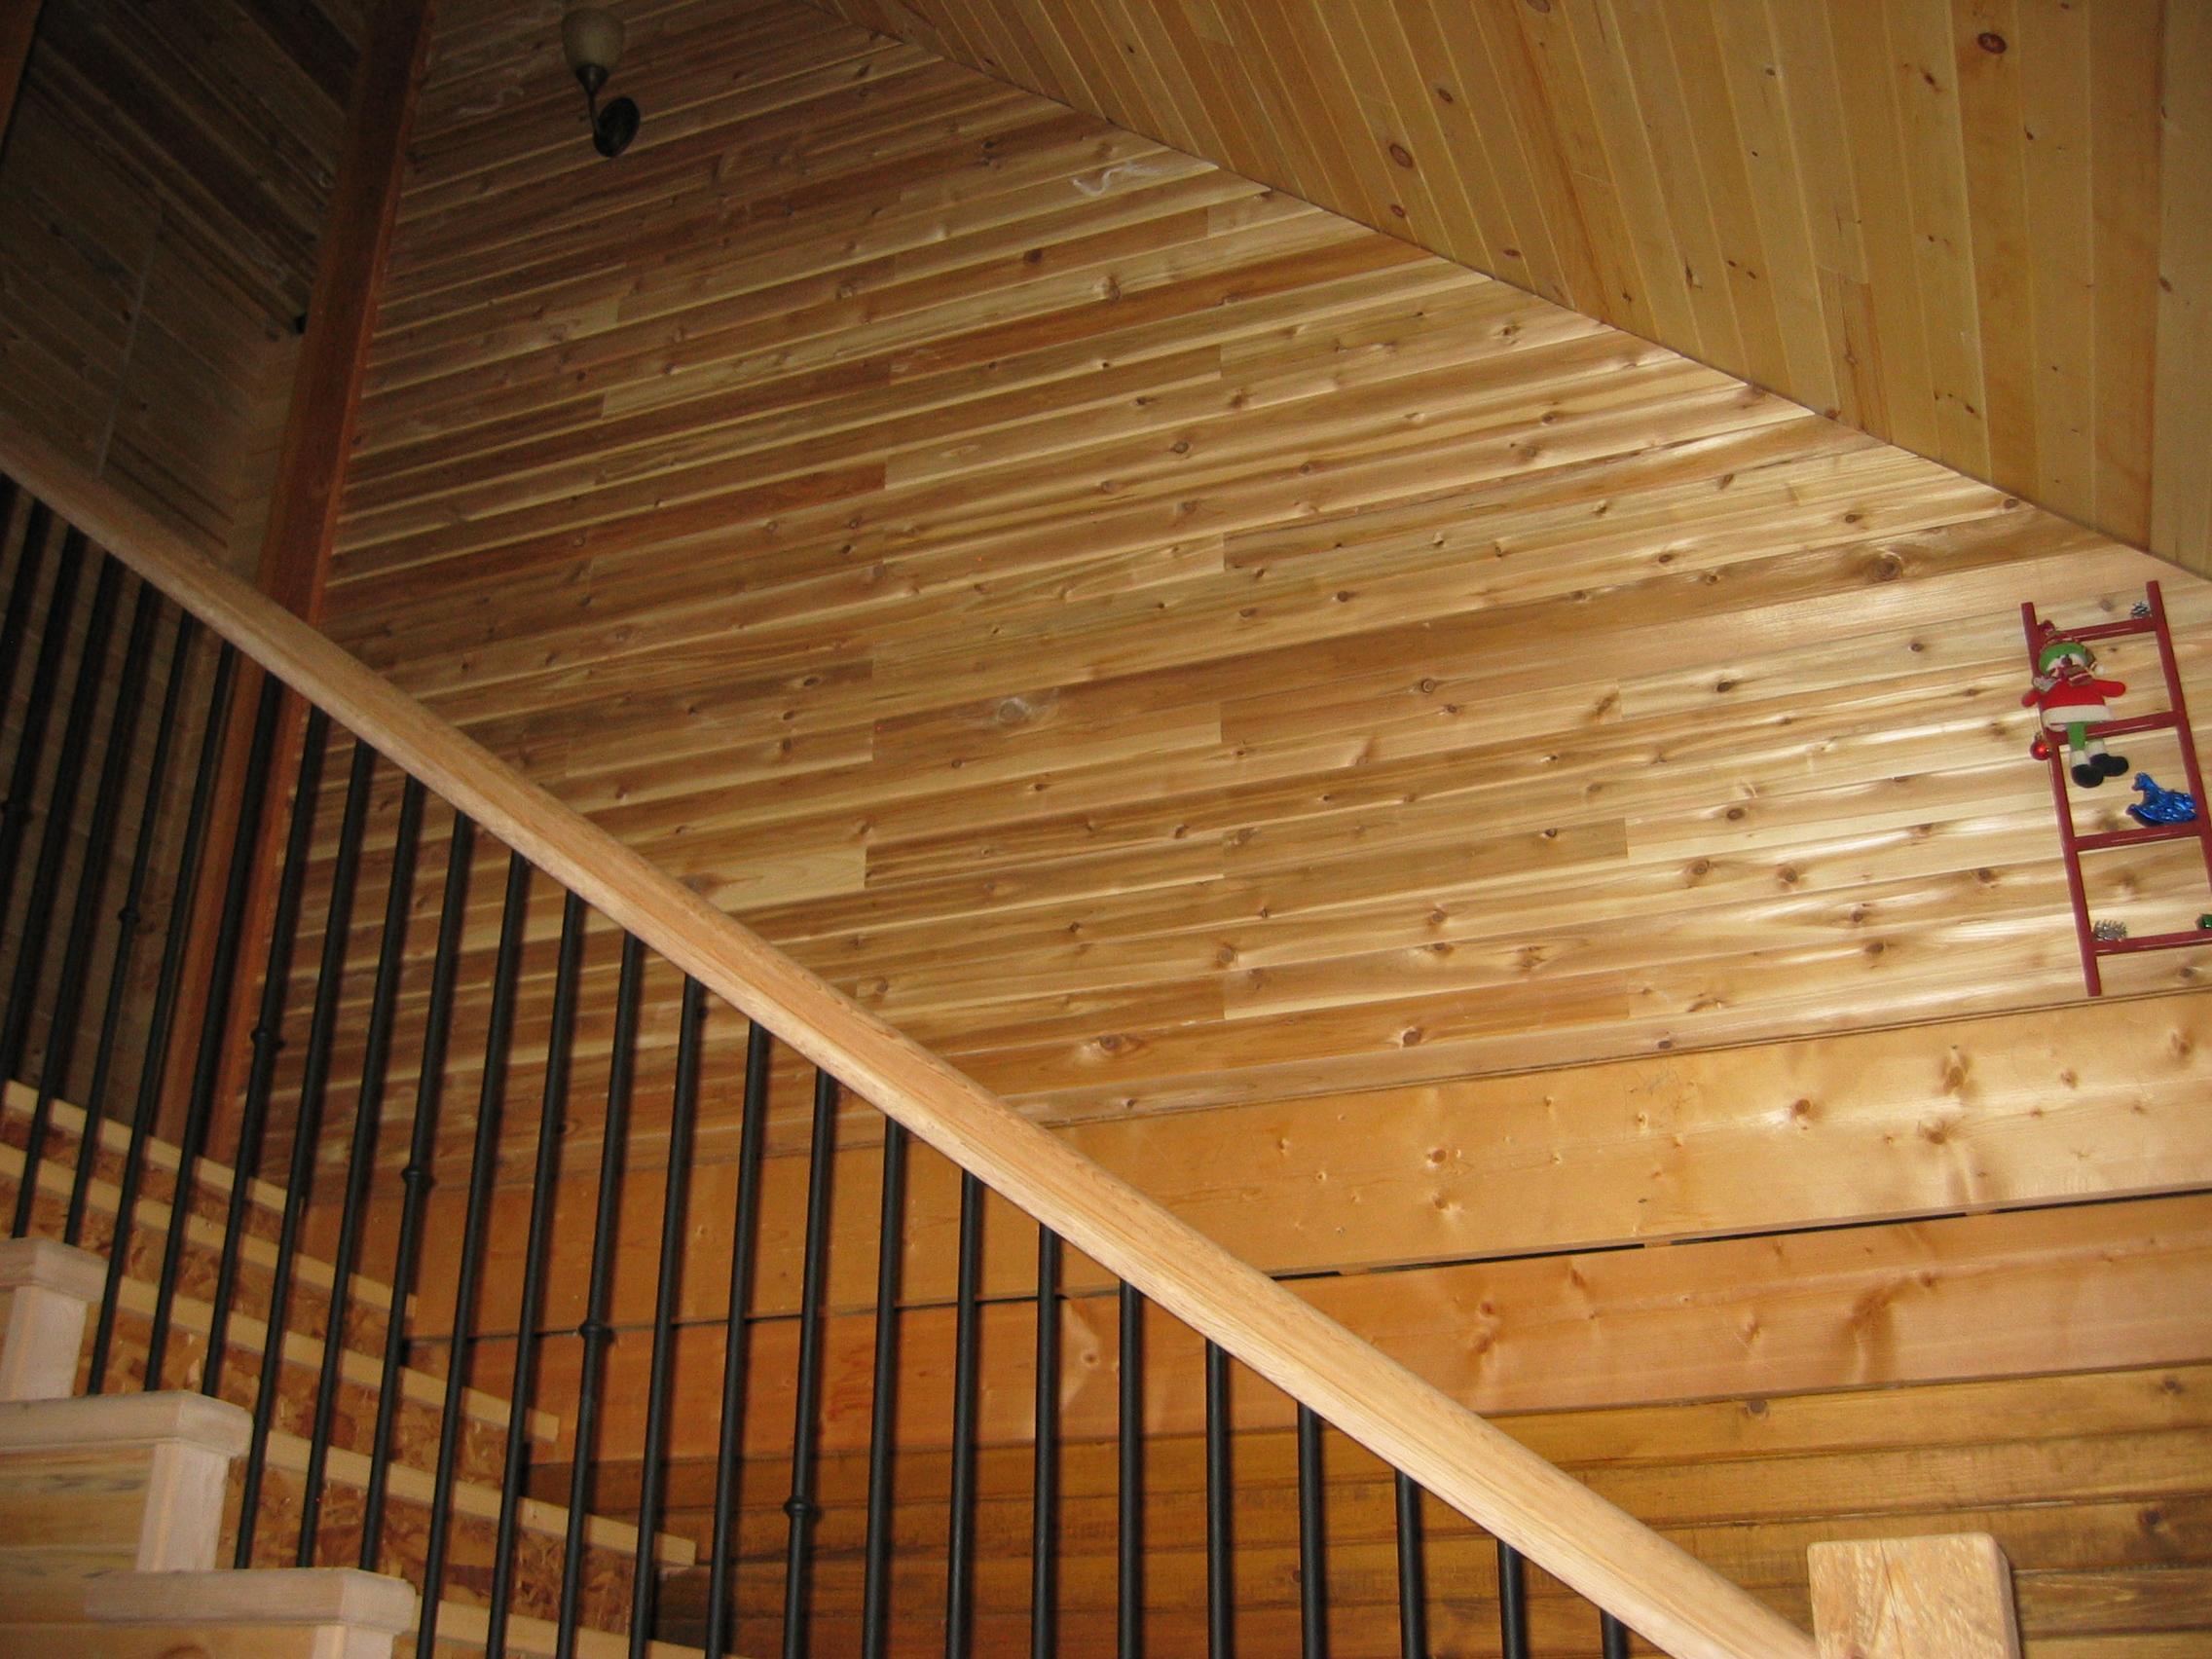 Cedar KD 1x4 Cabin Grade T&G Bonnici_7883.JPG